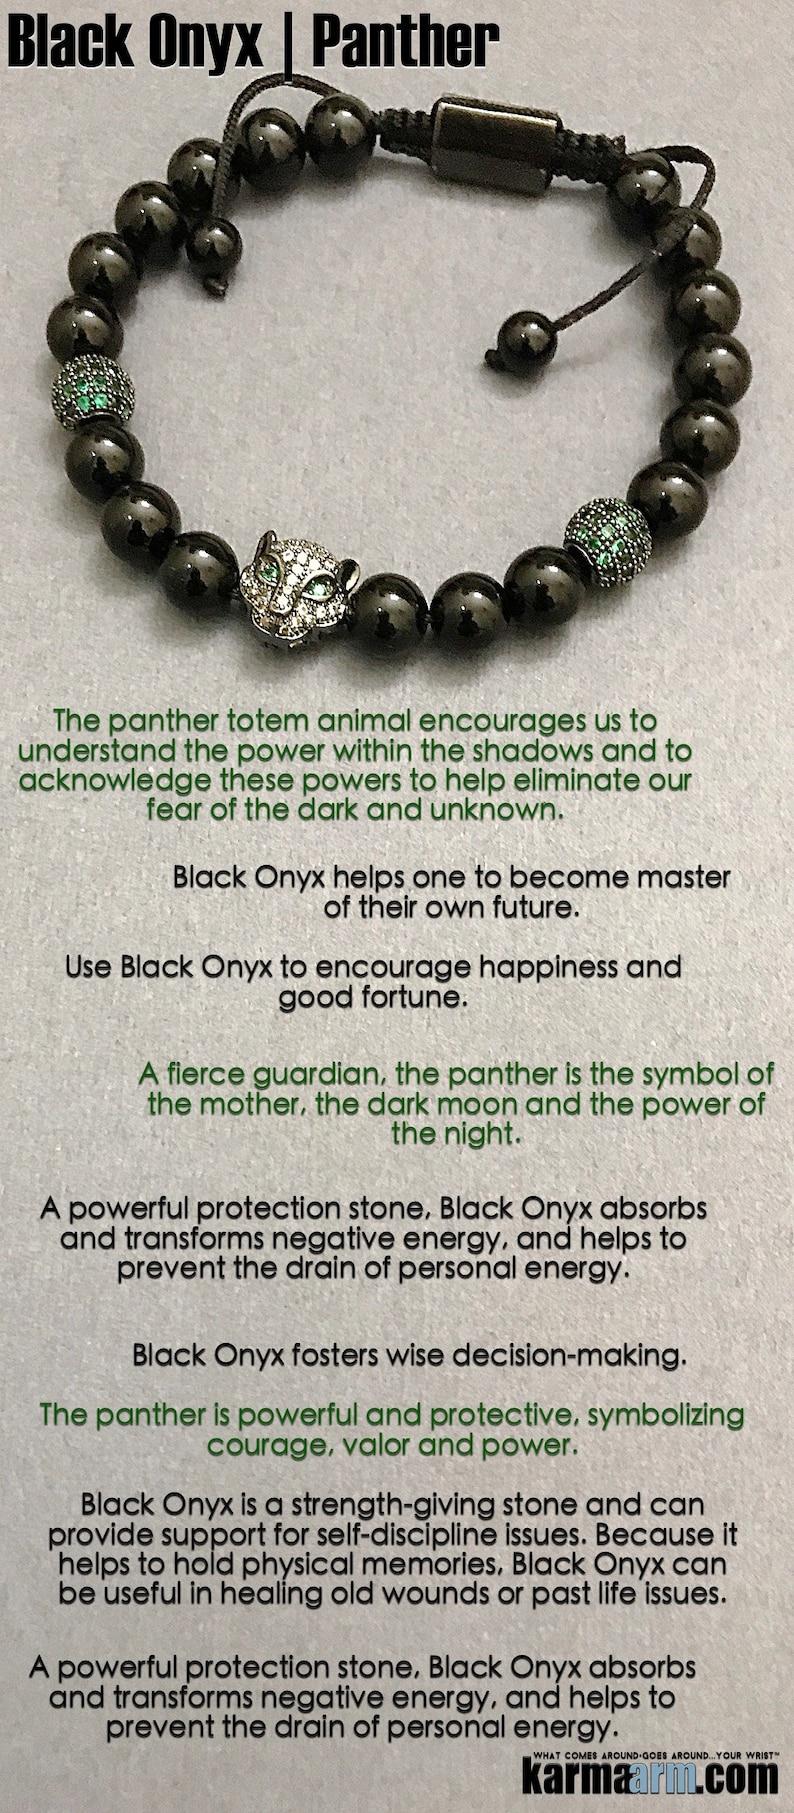 Rose Quartz KarmaArm Love Bracelet Opal CZ Diamond Pave Beaded Reiki Yoga Chakra Bracelet Meditation Jewelry Boho Stretch Bracelets Amethyst Morganite Romance: Green Quartz